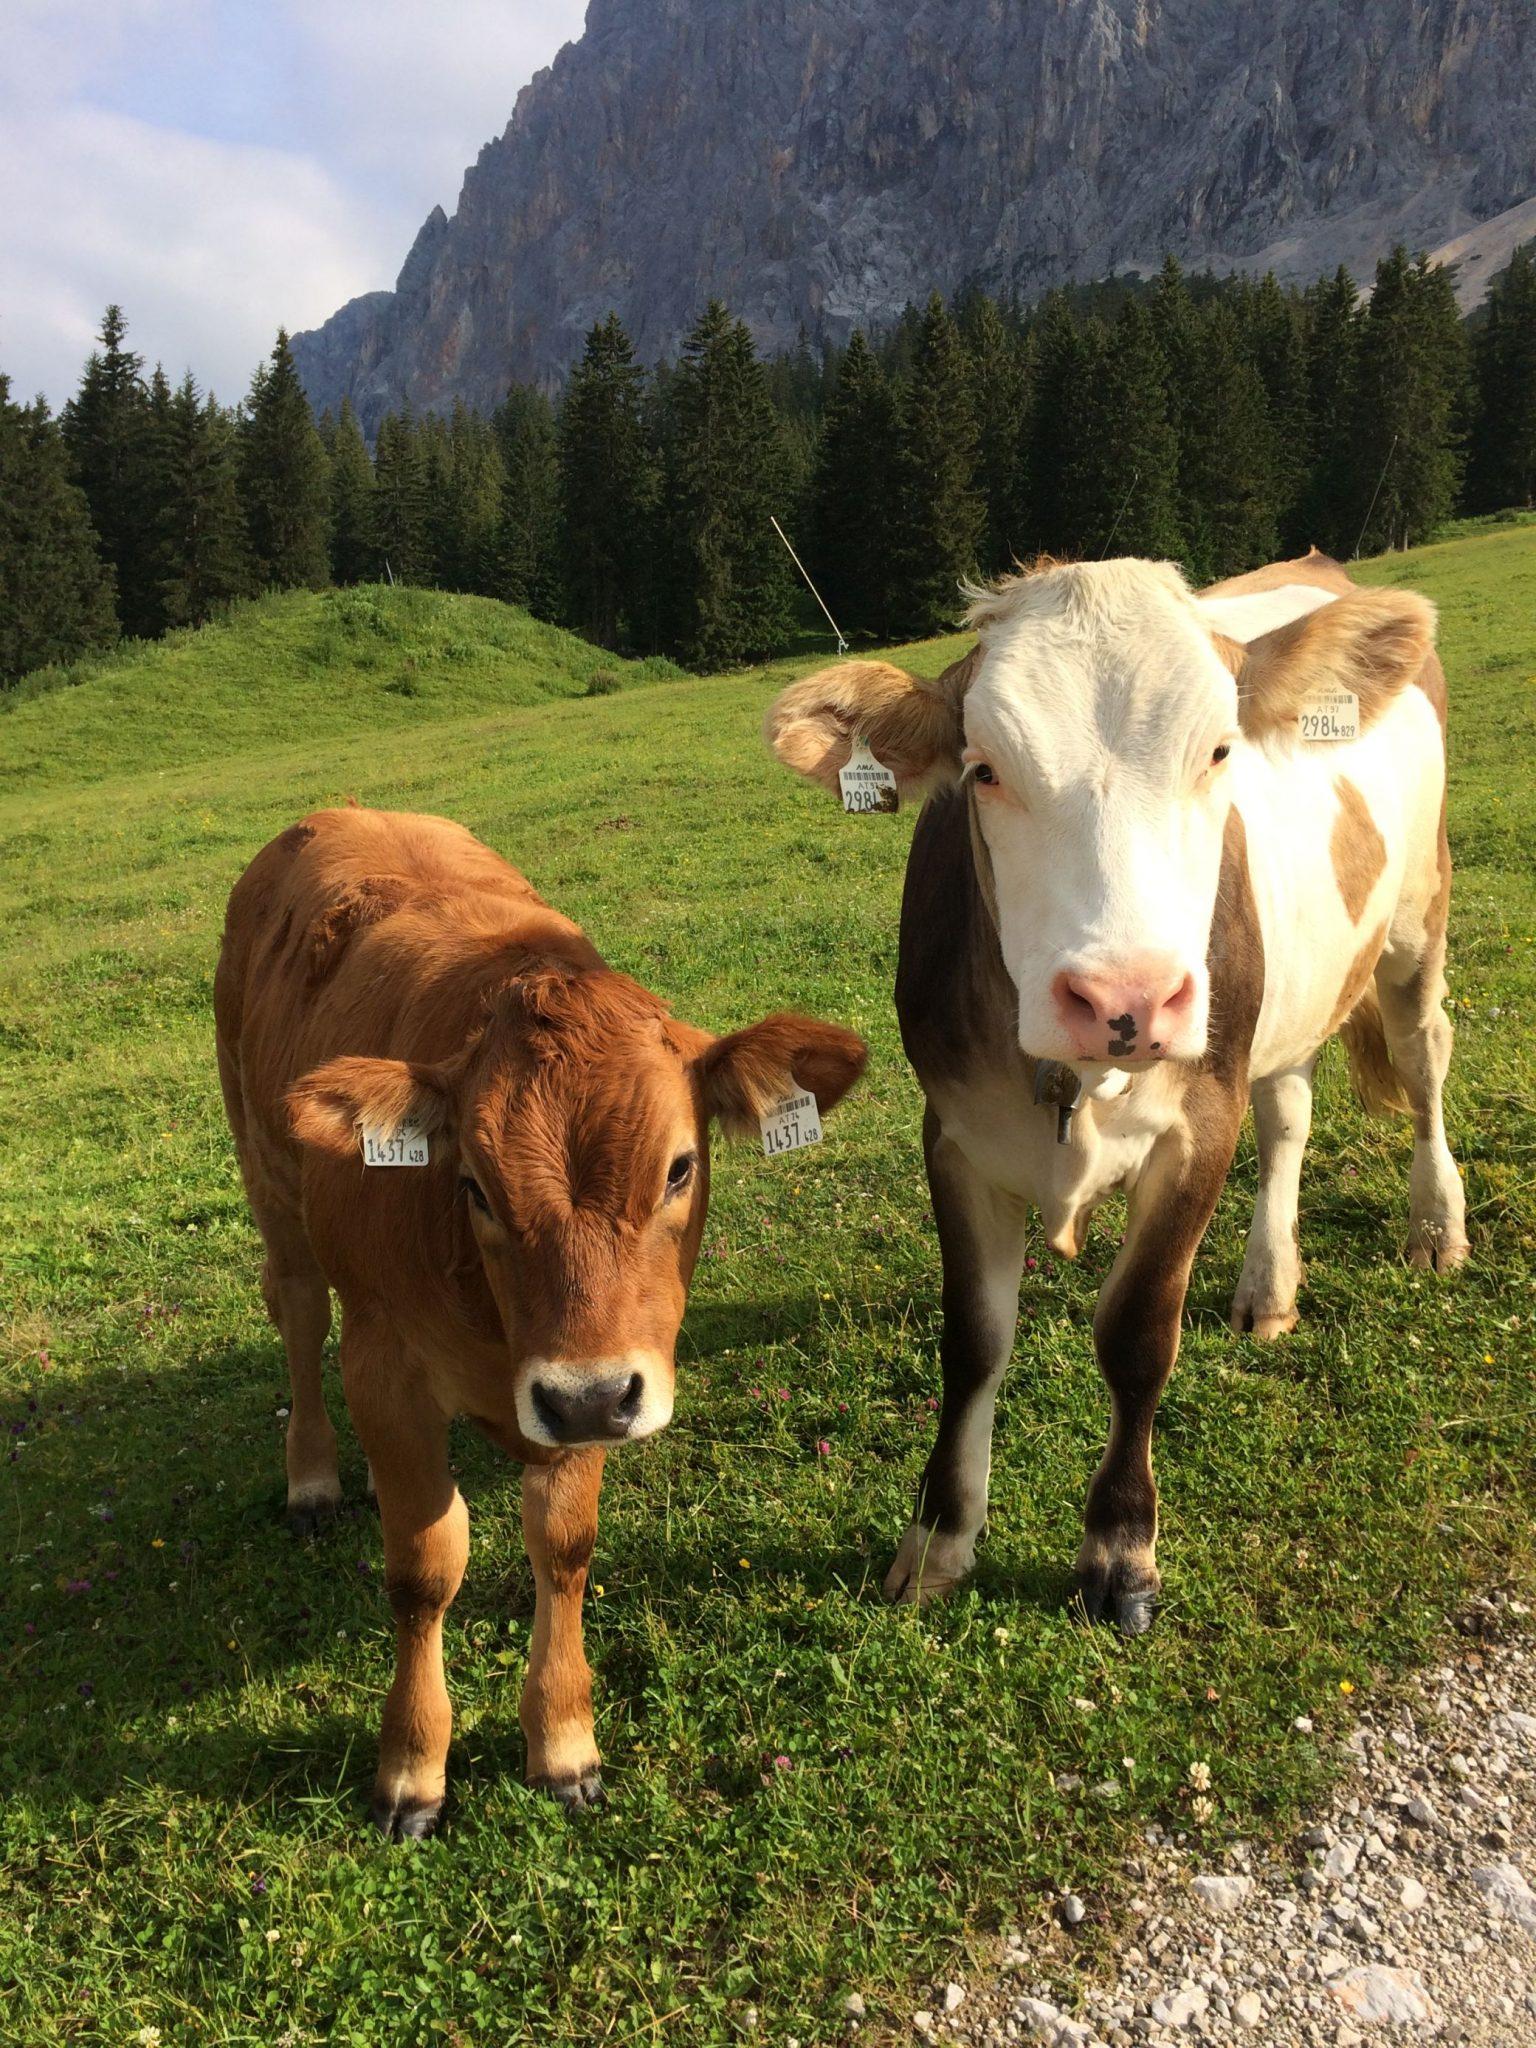 Auf dem Weg zu den Plattspitzen in der Tiroler Zugspitzarena begrüßt uns das neugierige Jungvieh | Climbers Paradise